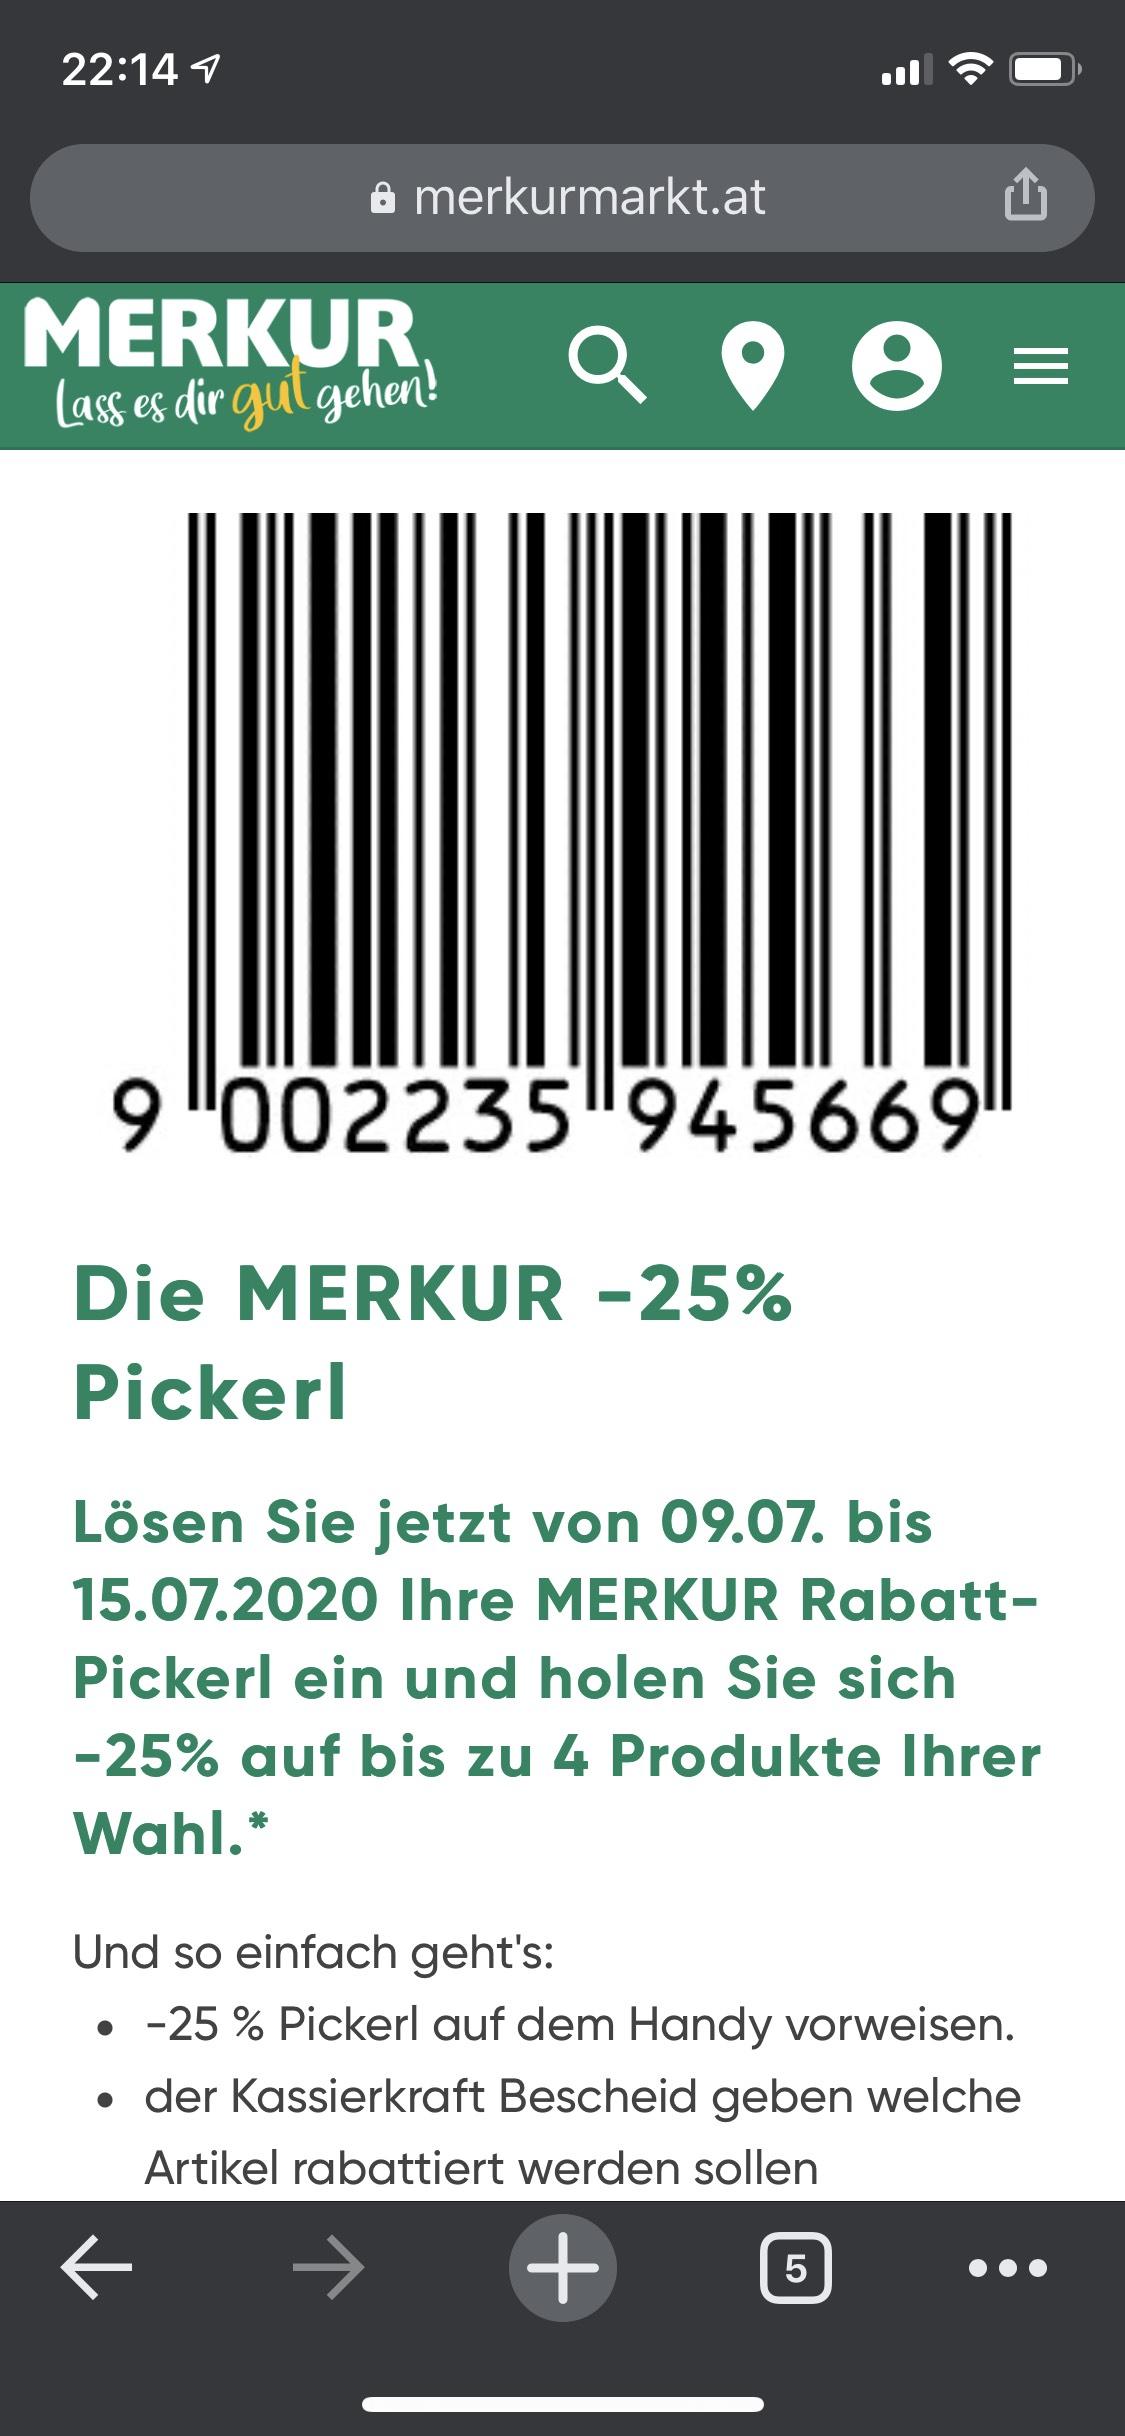 Merkur -25% Pickerl (09.07 - 15.07)